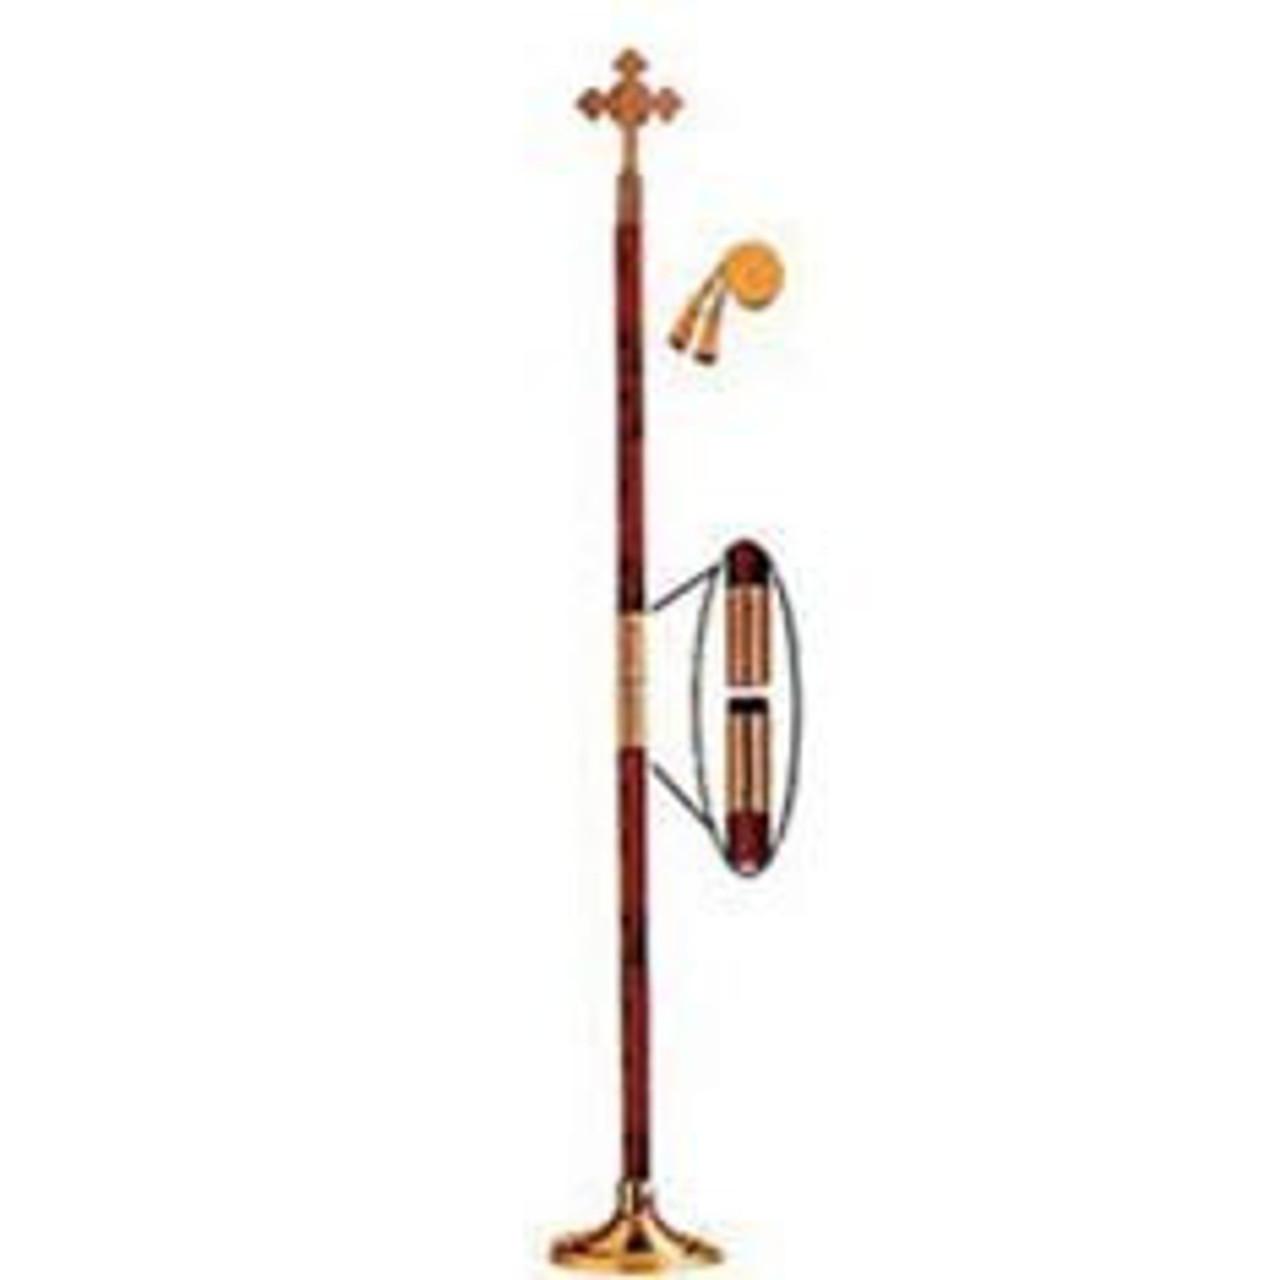 Indoor Display Pole w/ Catholic Cross